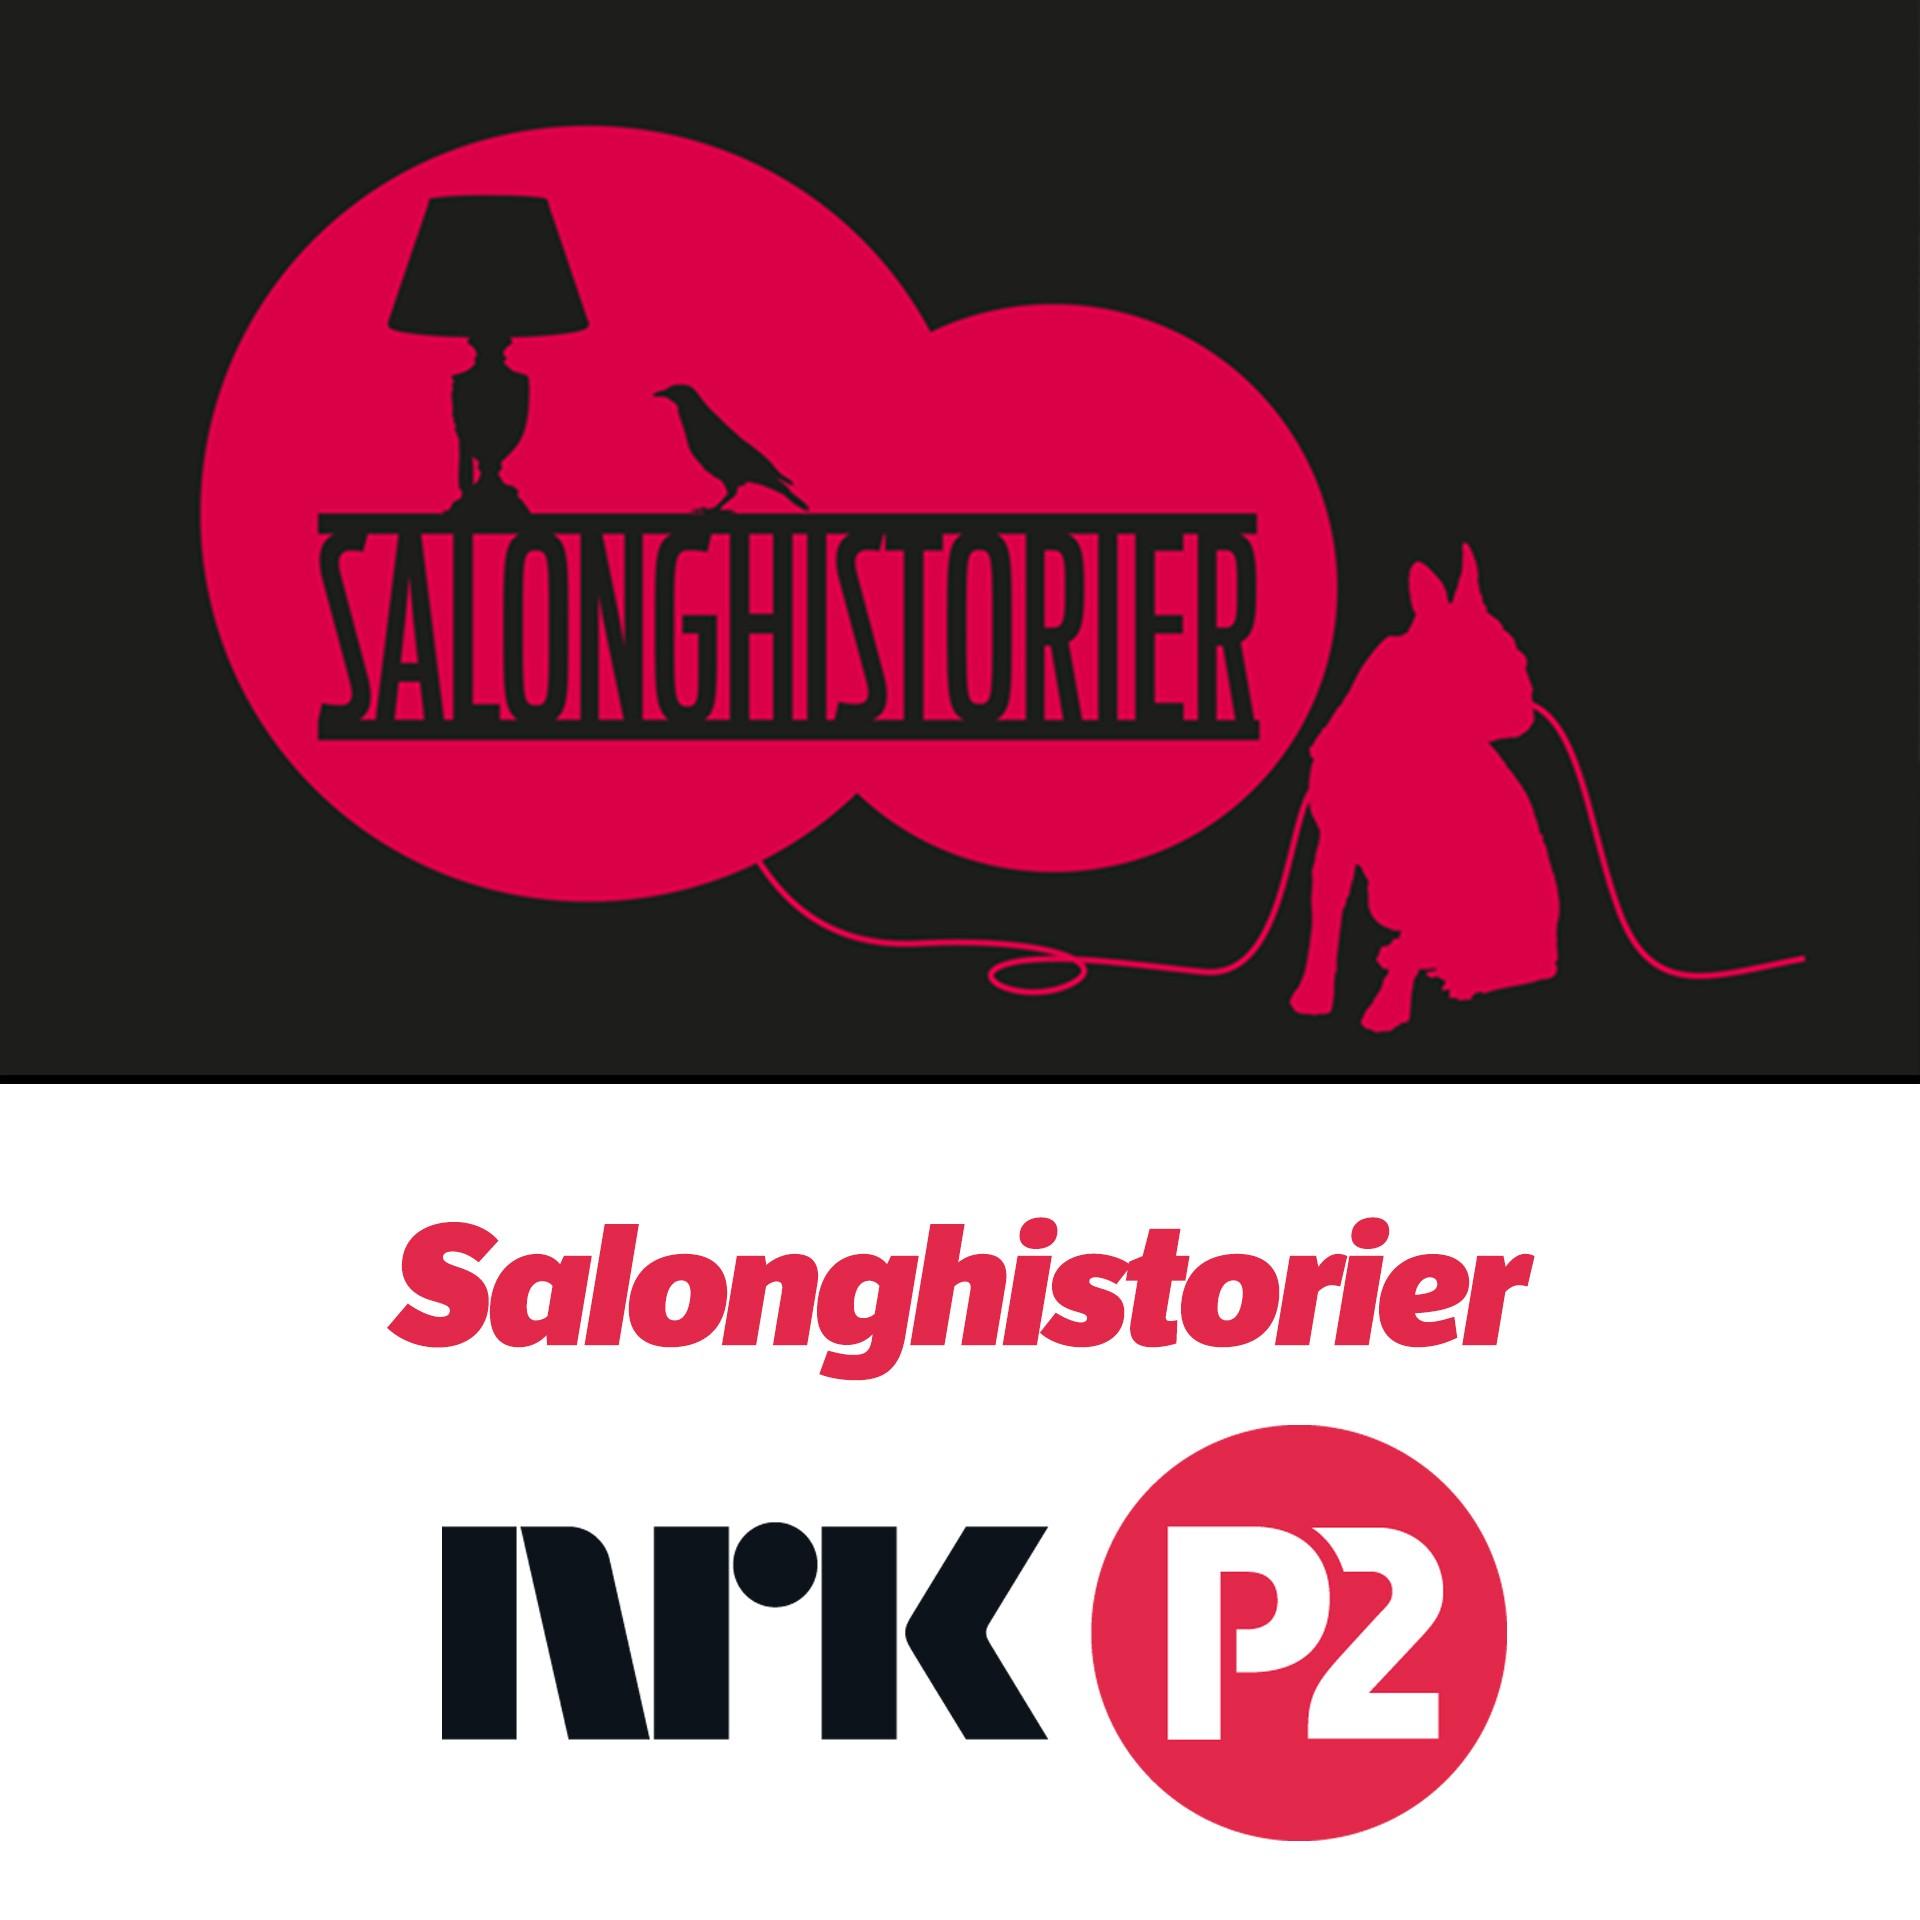 Salonghistorier